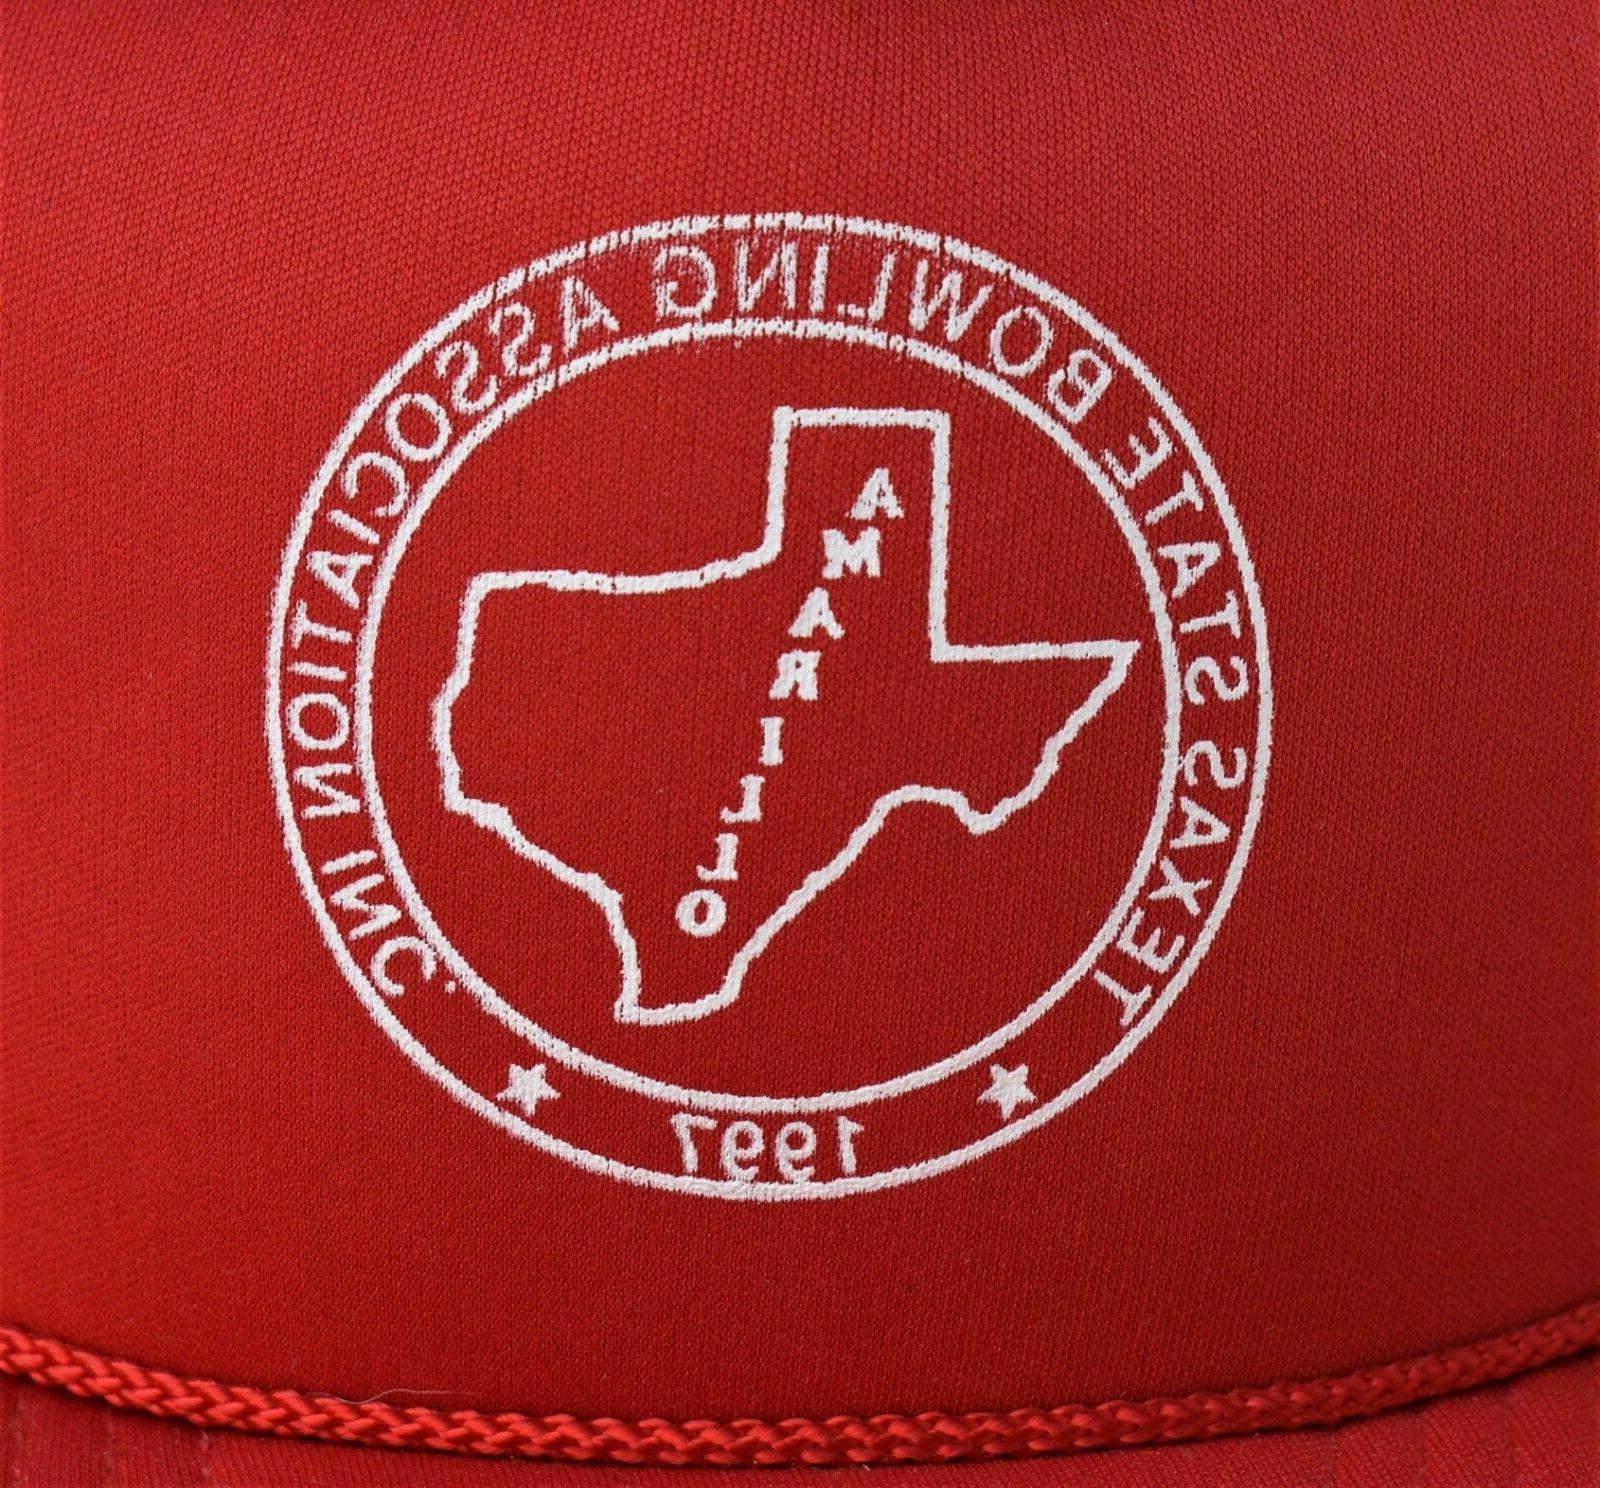 Texas 1997 Amarillo Cap Hat Snapback